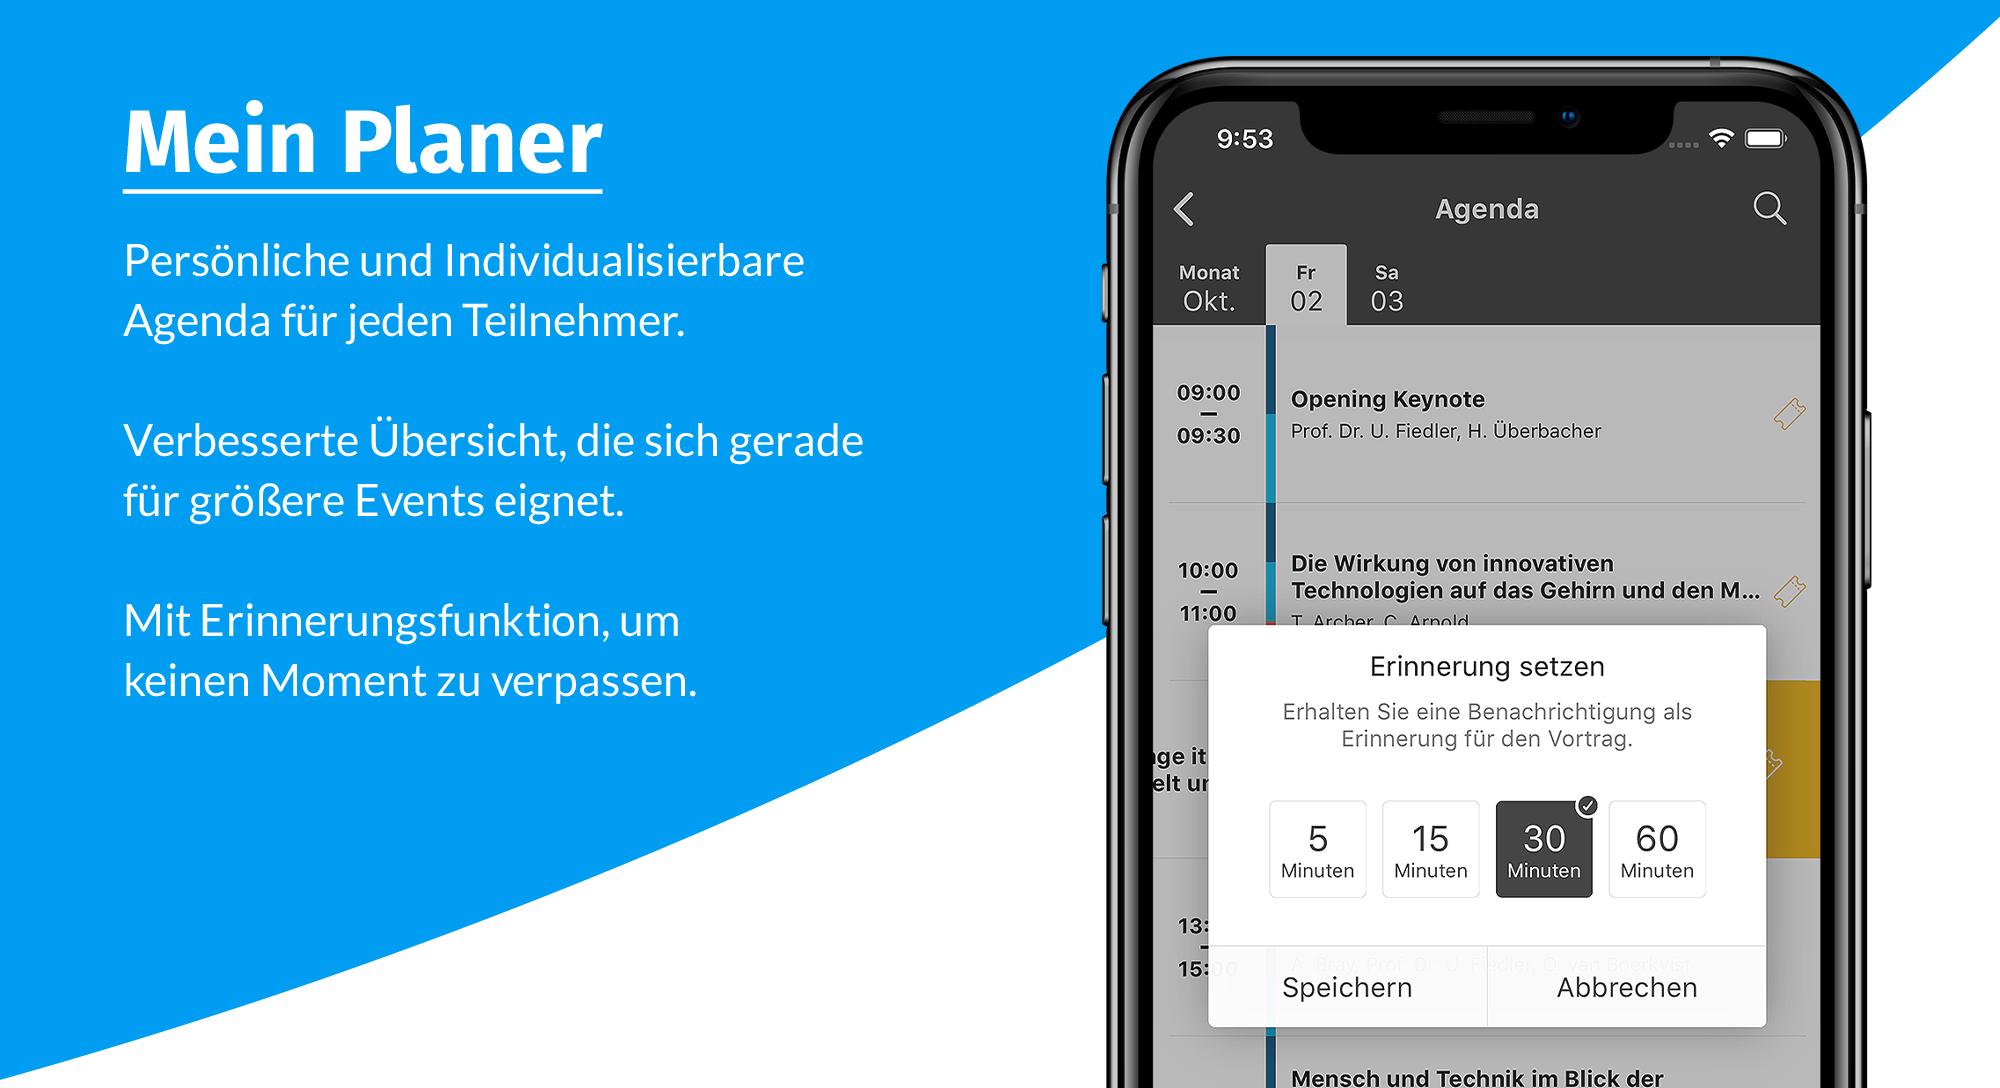 event app - mein planer details